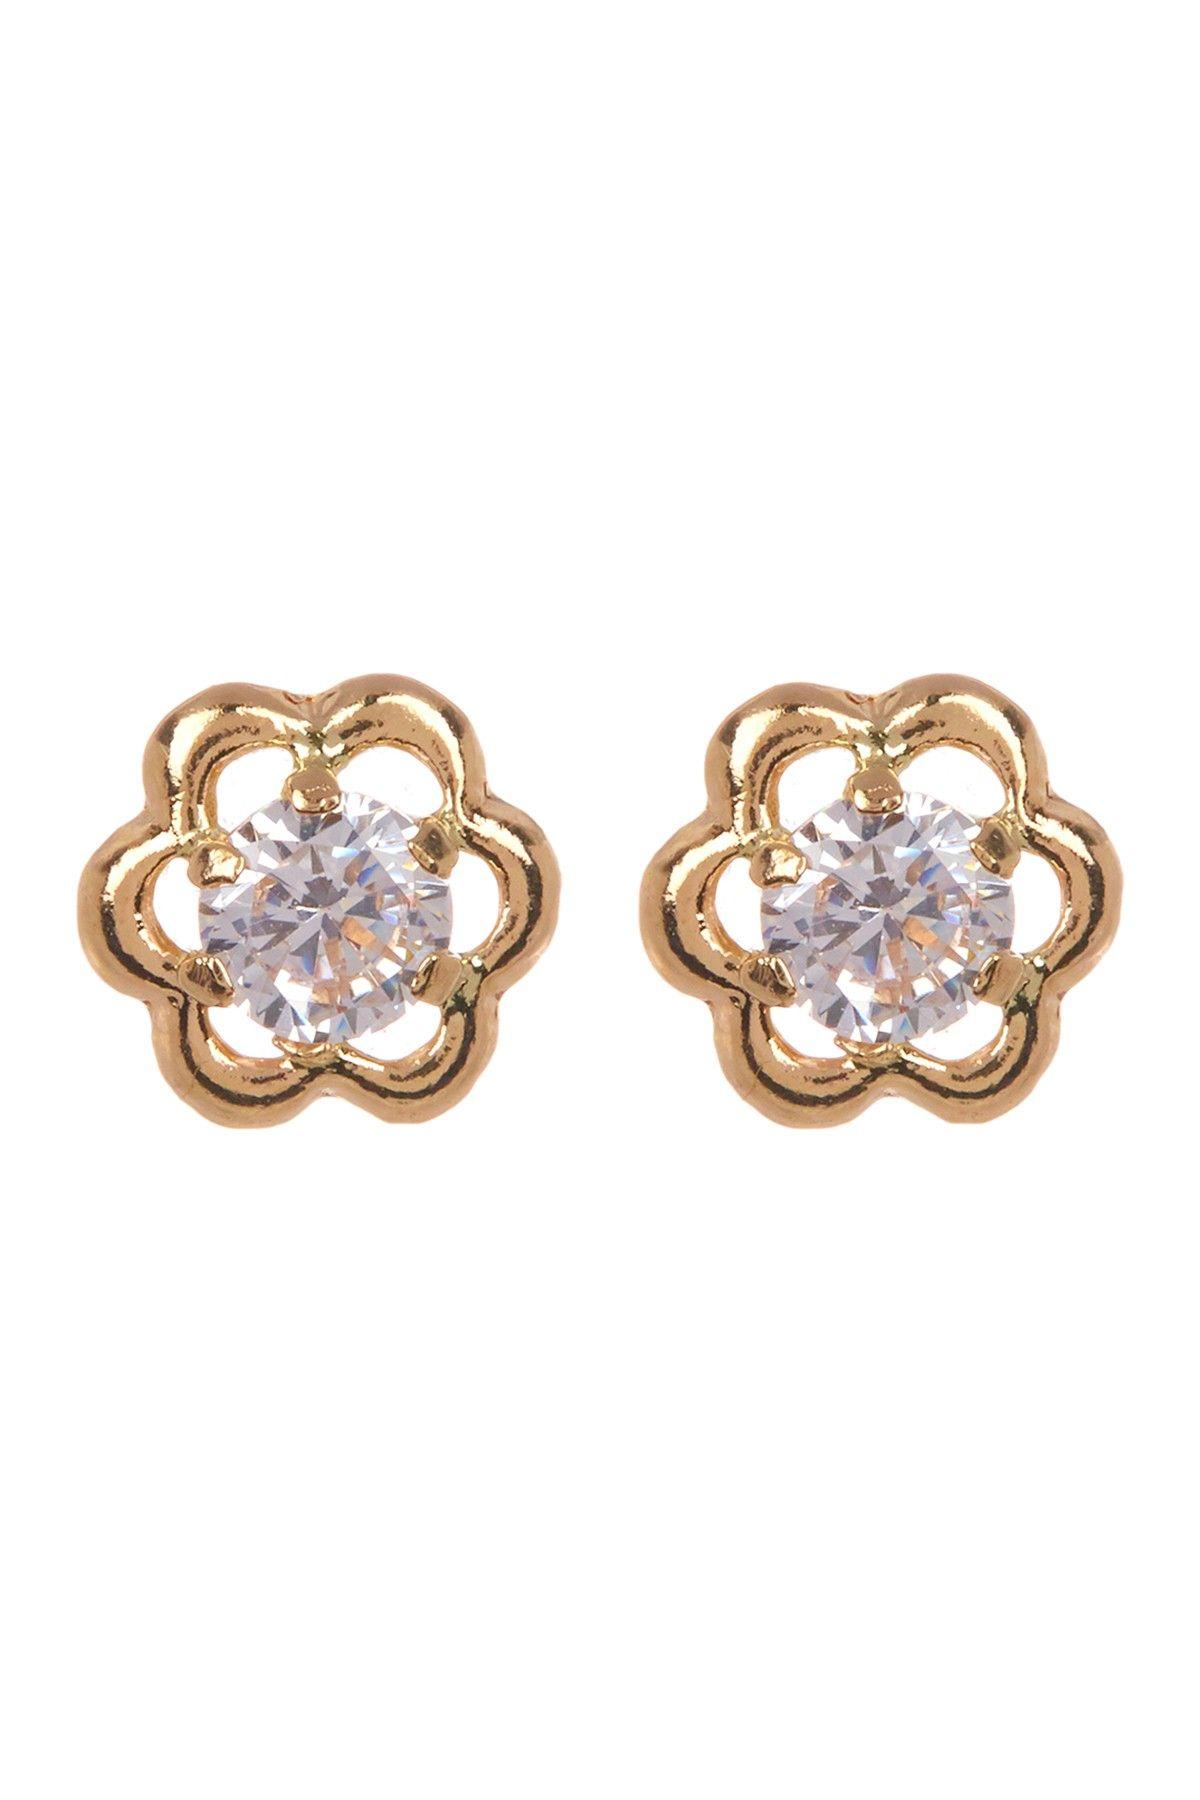 83b012099 14K Yellow Gold CZ Flower Stud Earrings | Products | Jewelry, Stud ...